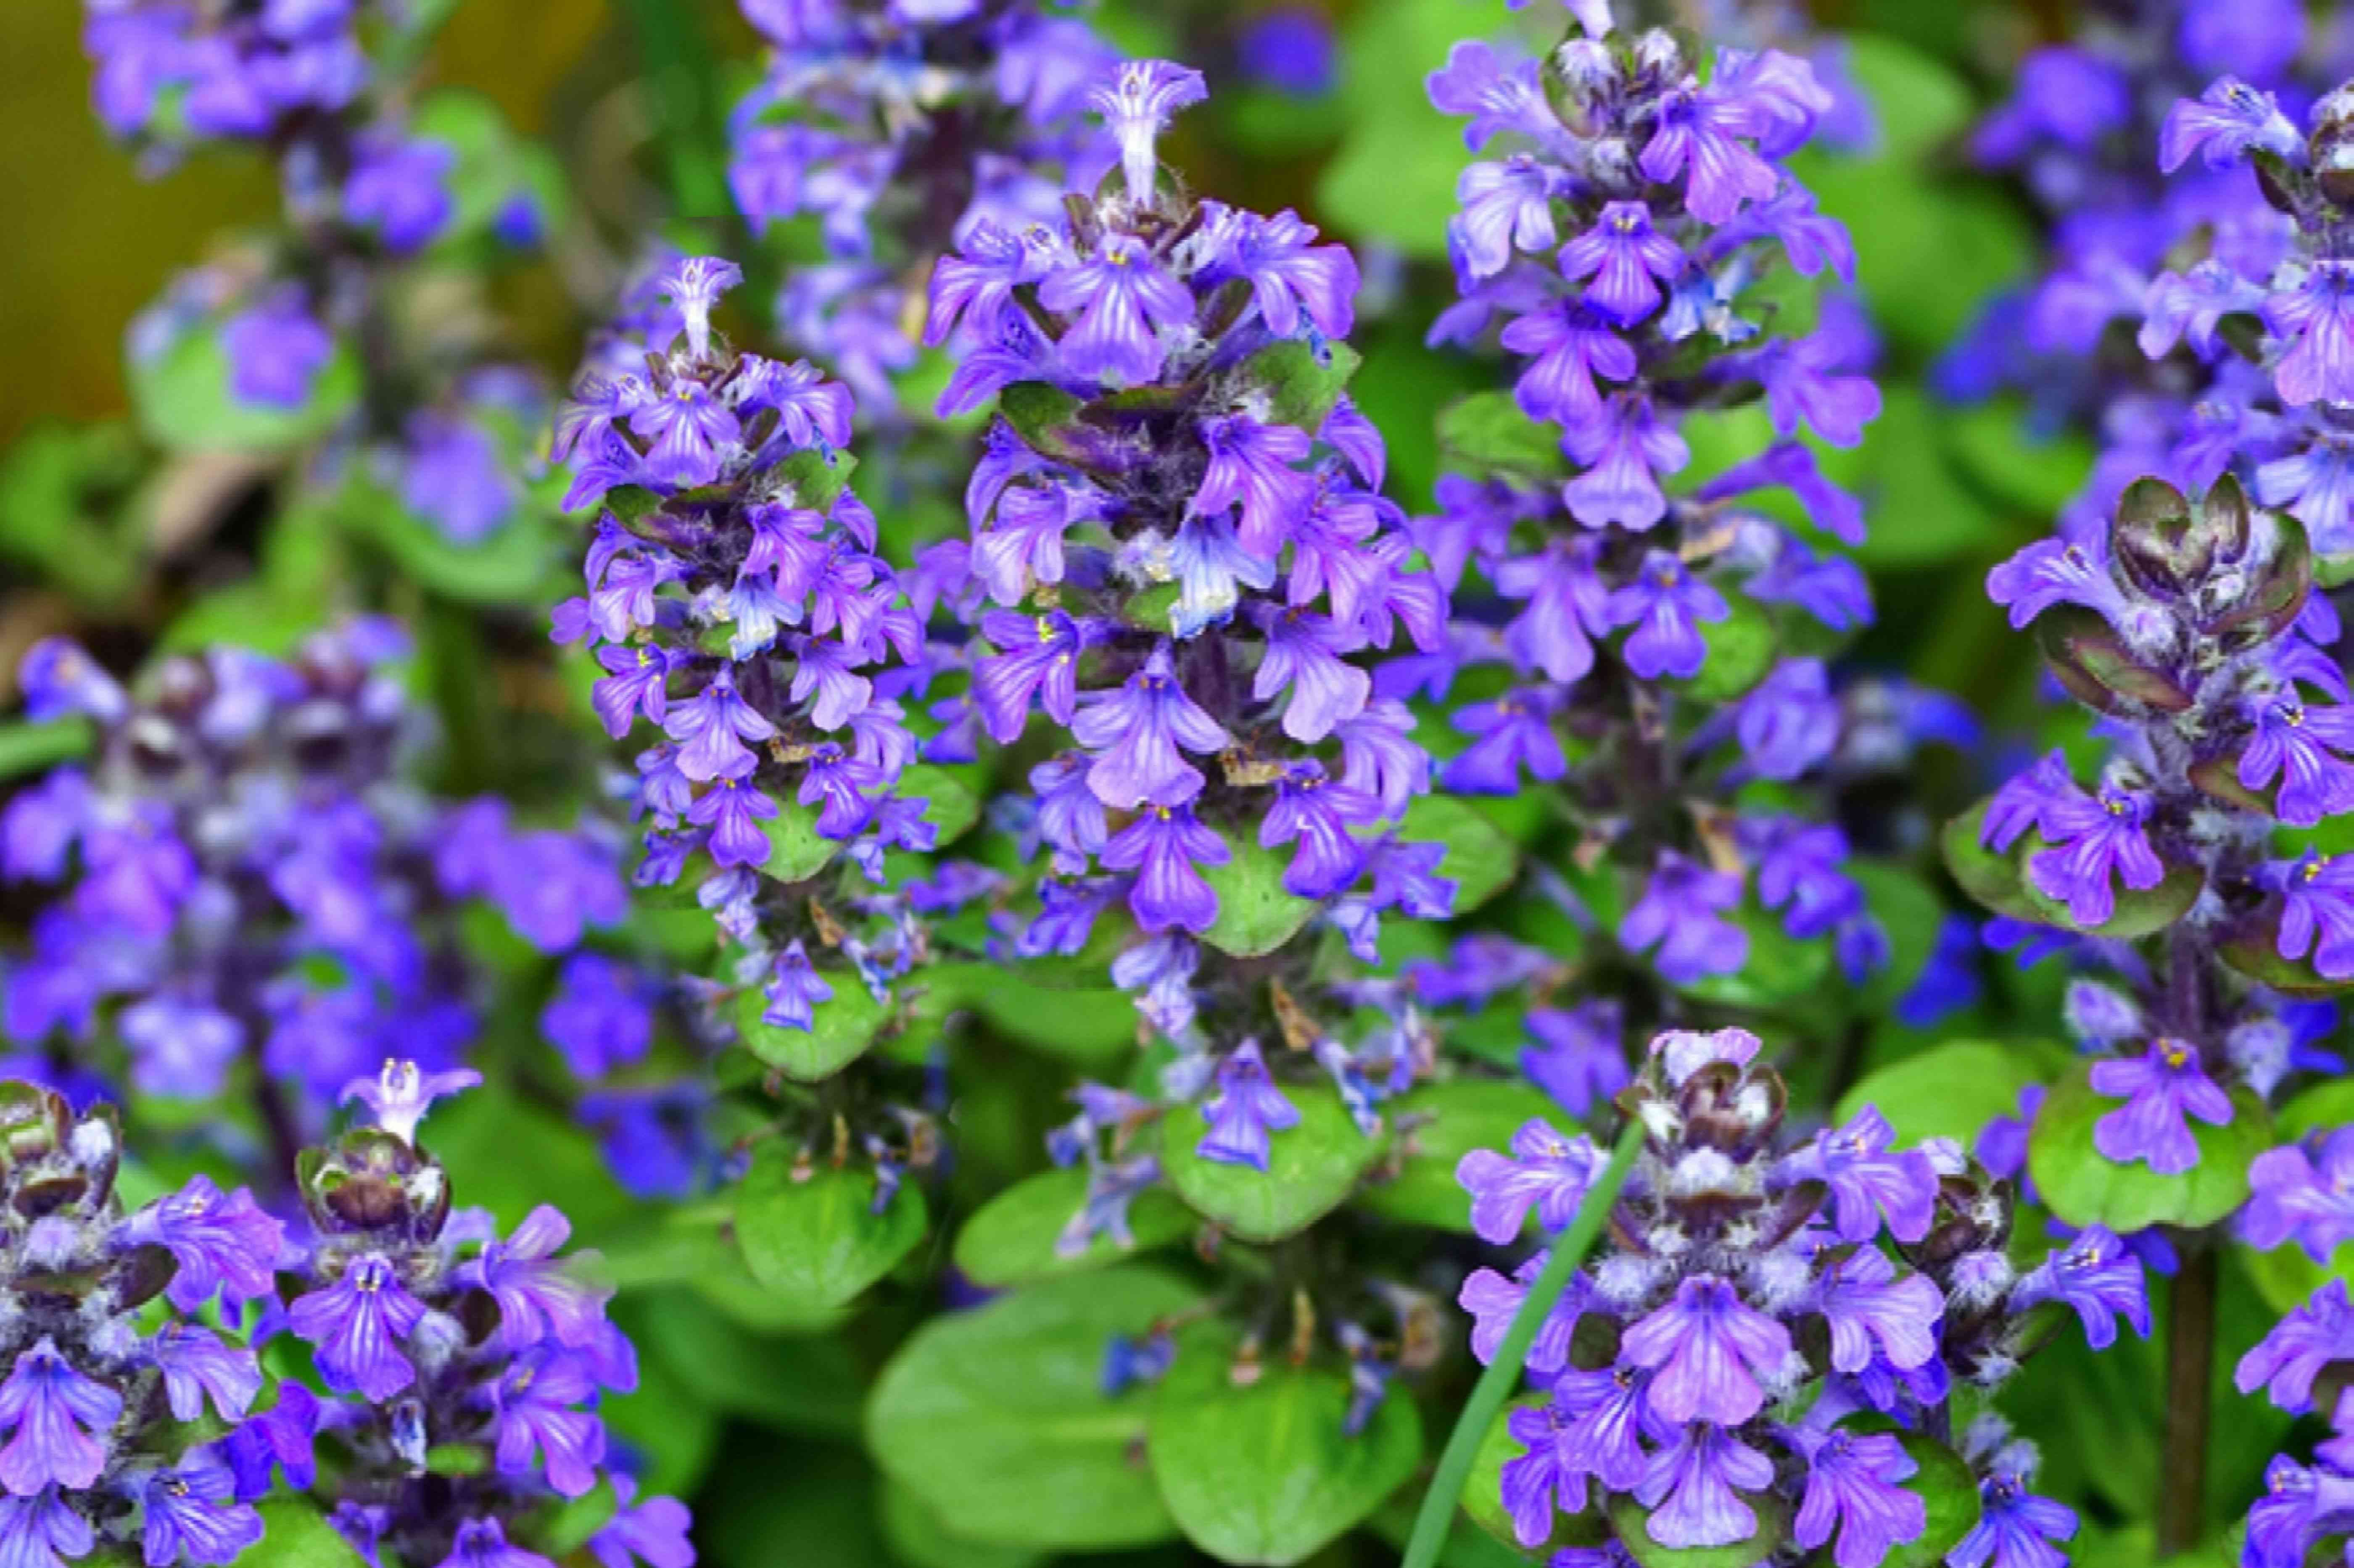 Ajuga plant with small purple flower spikes closeup